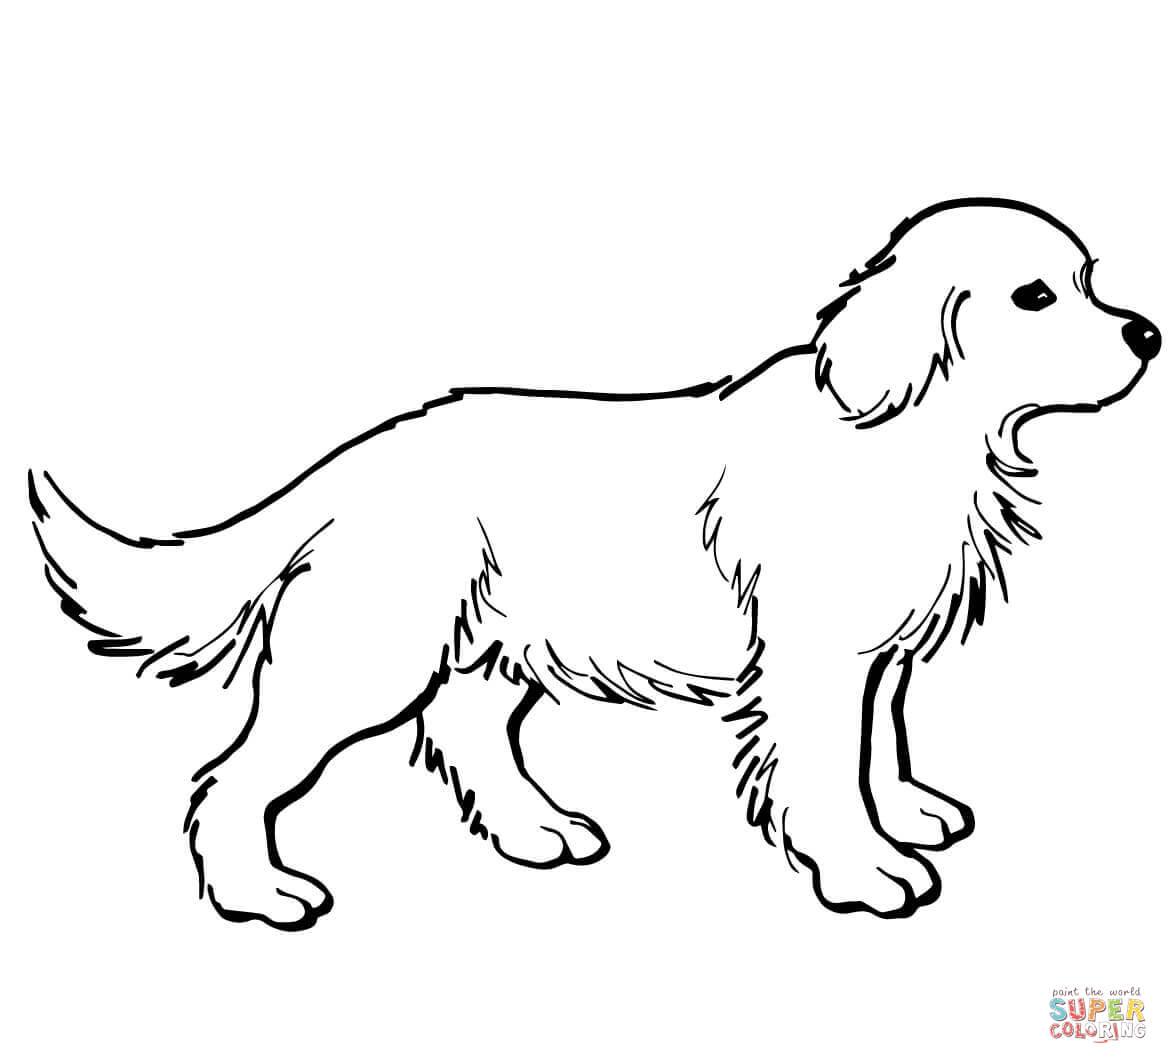 1168x1064 Labrador Retriever Coloring Page Free Printable Coloring Pages